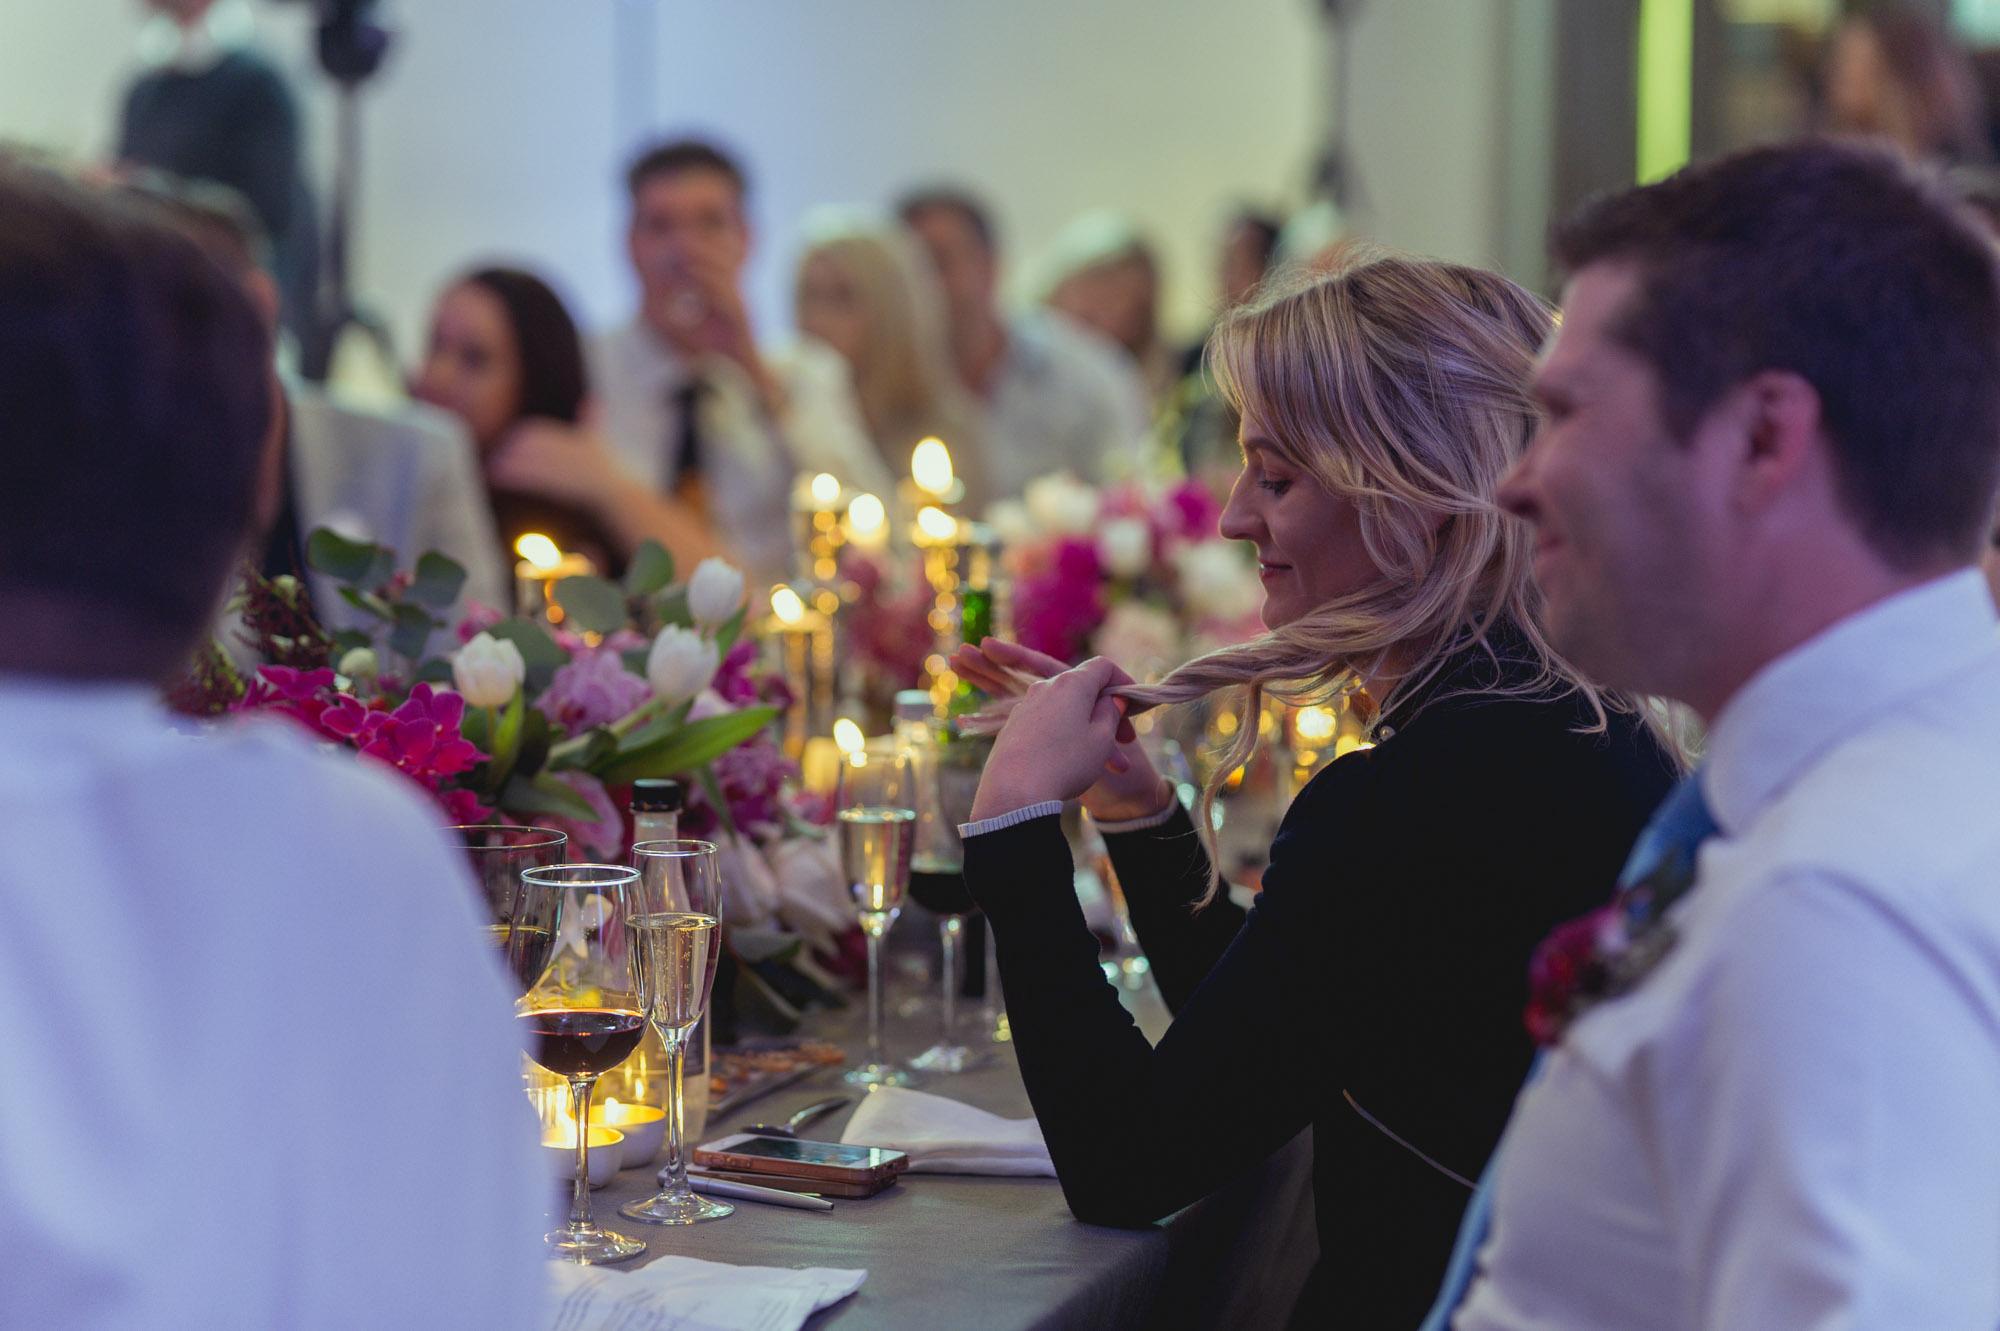 John-henry-wedding-photo-formalities-001-23.JPG